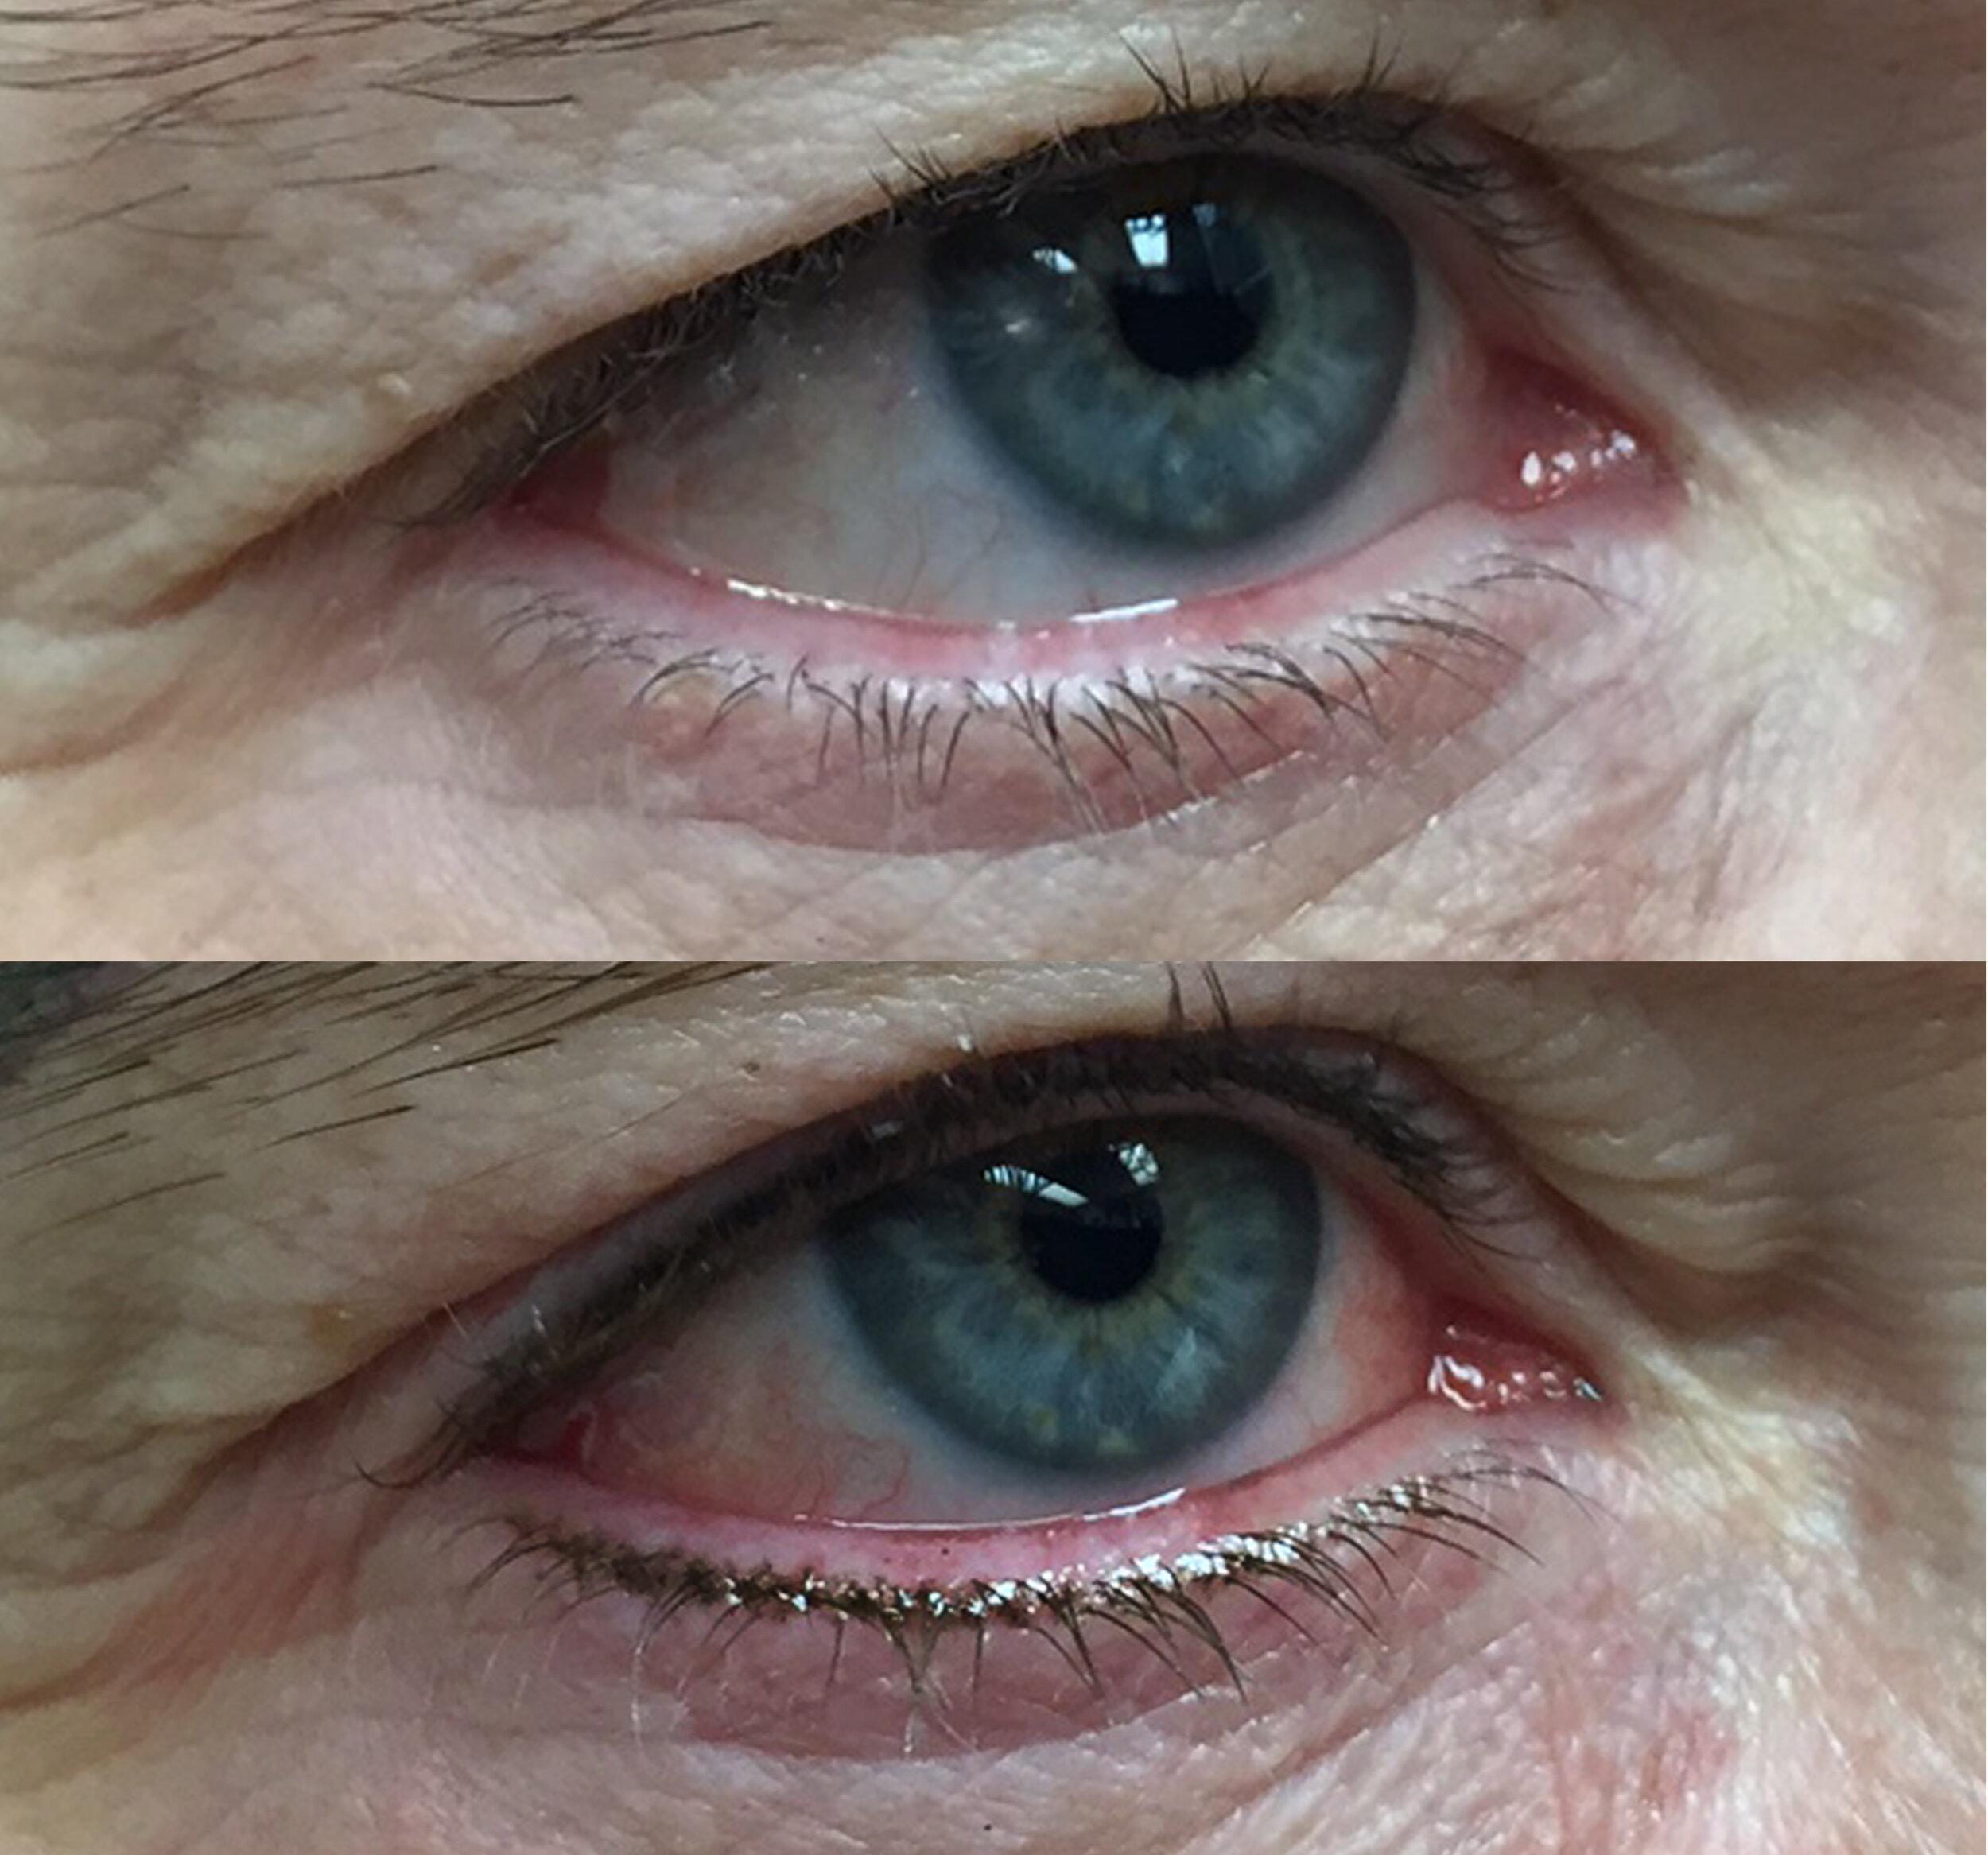 Liz Cook Tattoo Permanent Makeup Eyeliner Lash Enhancement Before After.jpg